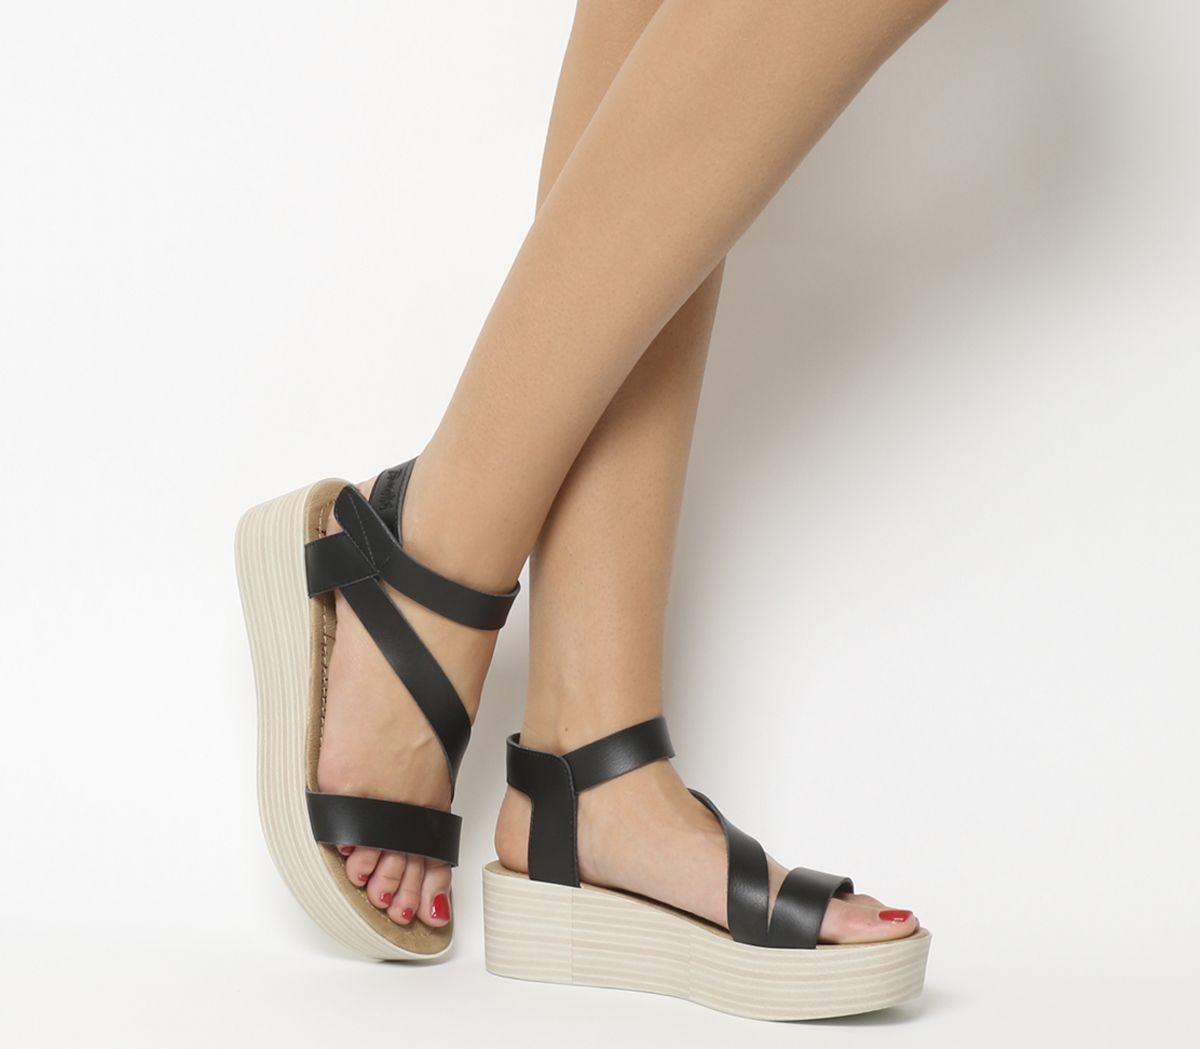 d1fd81a68ebfa Details about Womens Blowfish Lover Flatform Sandals Onyx Dyecut Heels